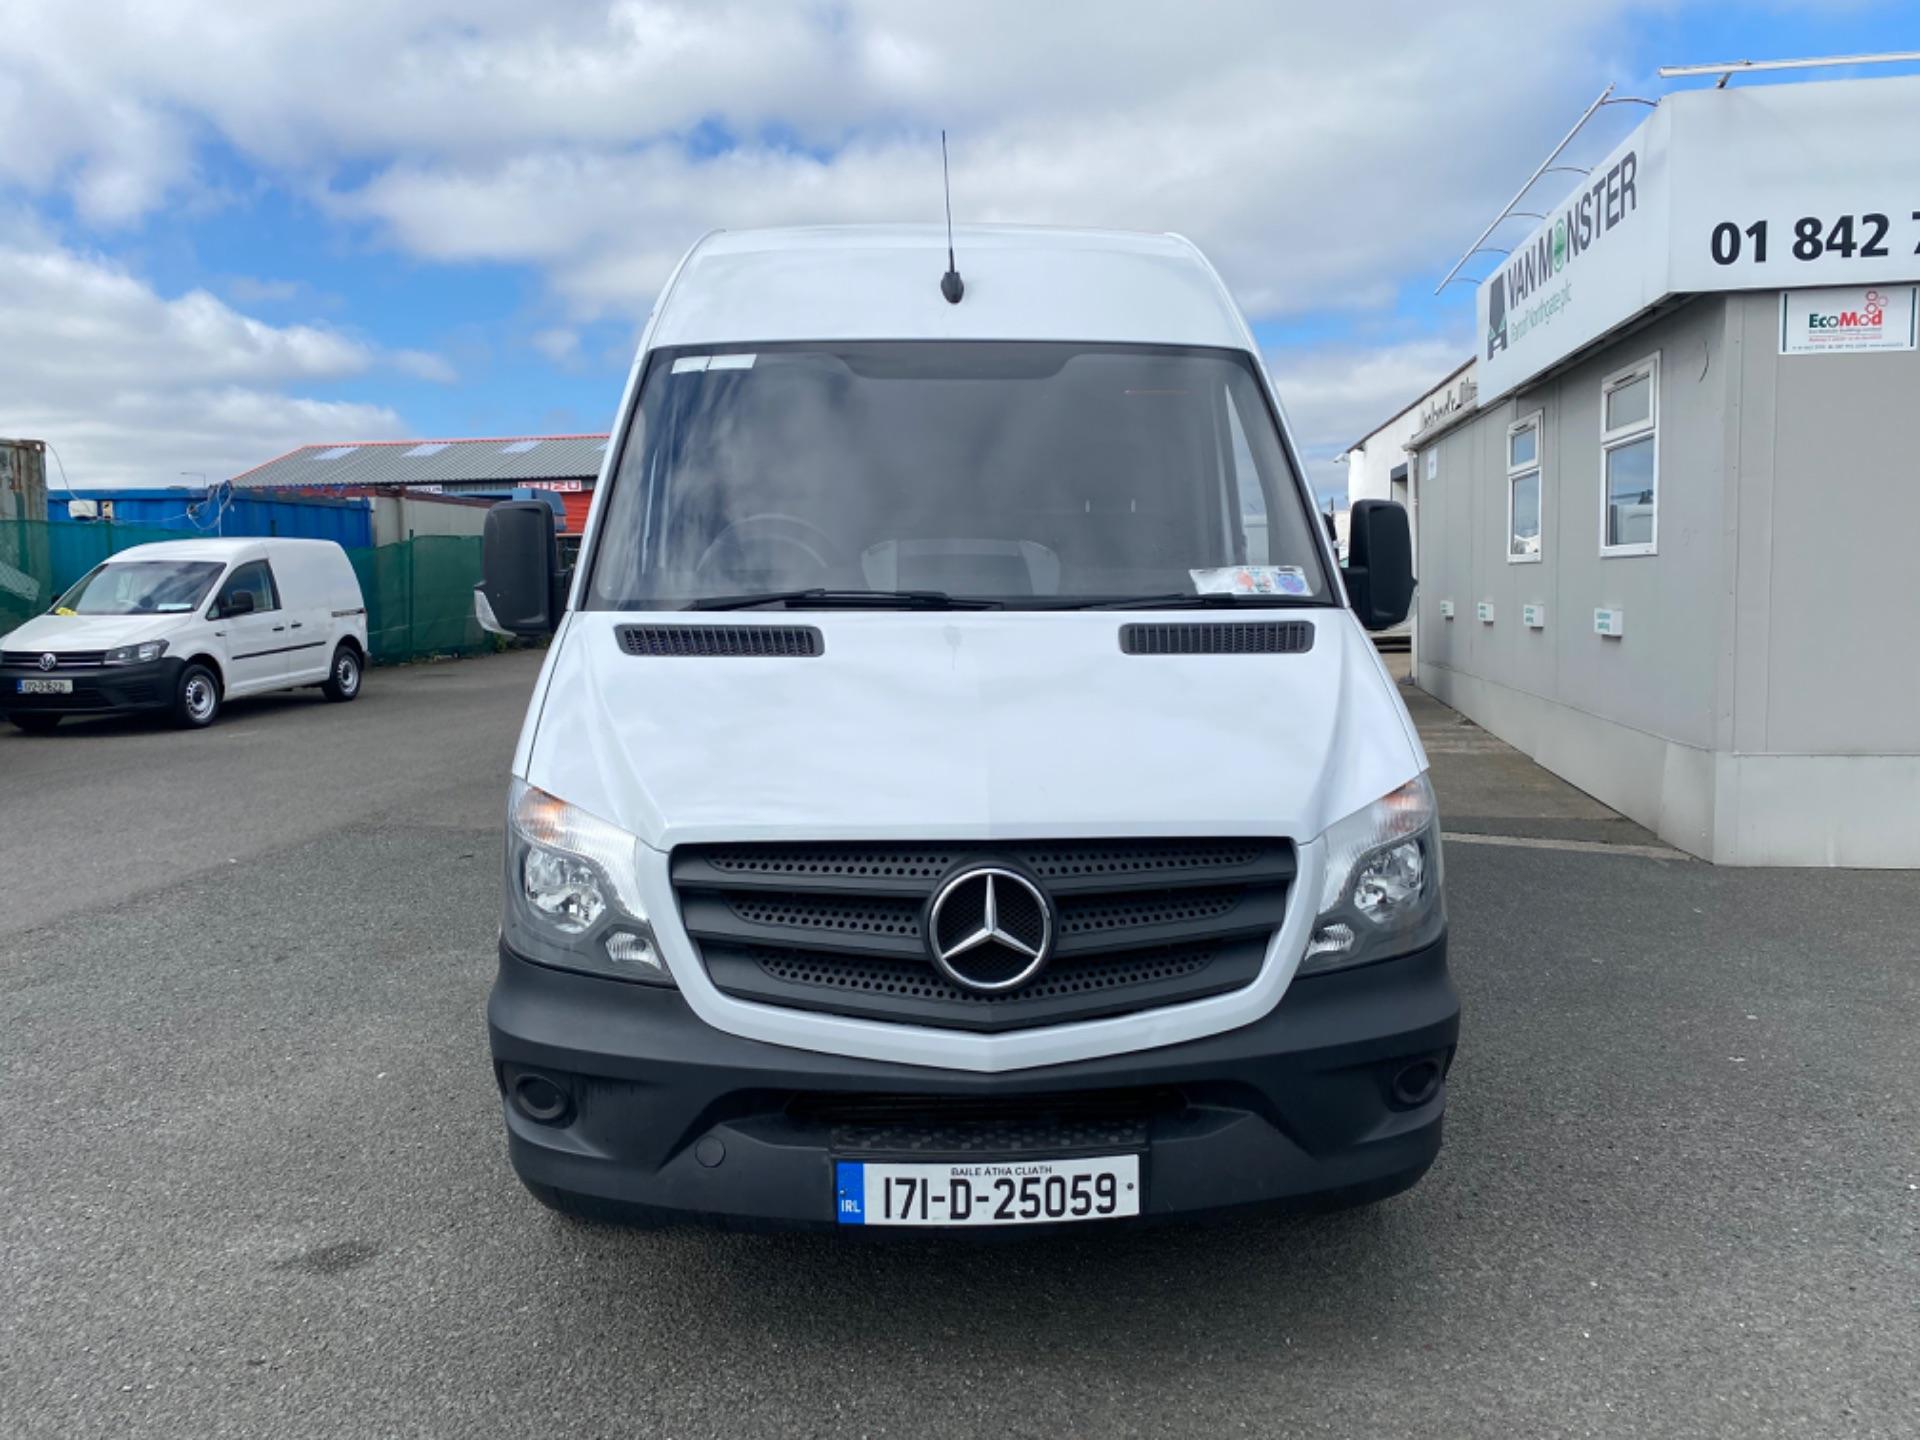 2017 Mercedes-Benz Sprinter 314/36 EU6 6DR (171D25059) Image 1